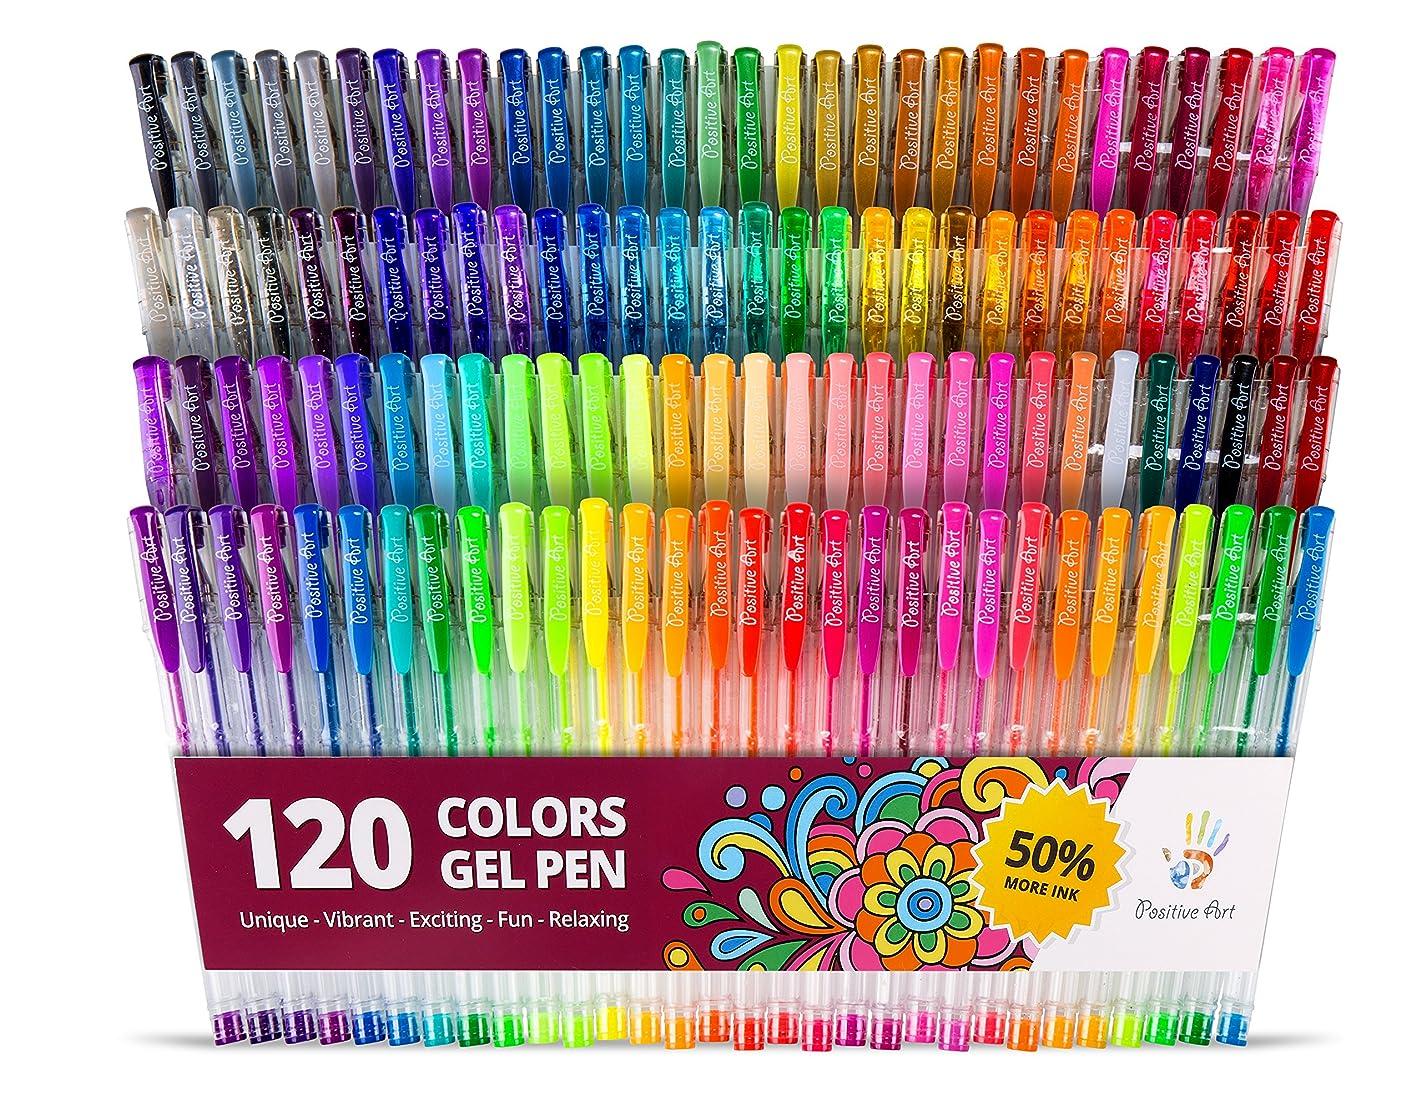 Positive Arts Gel Pen Set, 120-Unique Colors for Drawing, Includes Neon, Metallic, Glitter, Standard and Pastel Colors